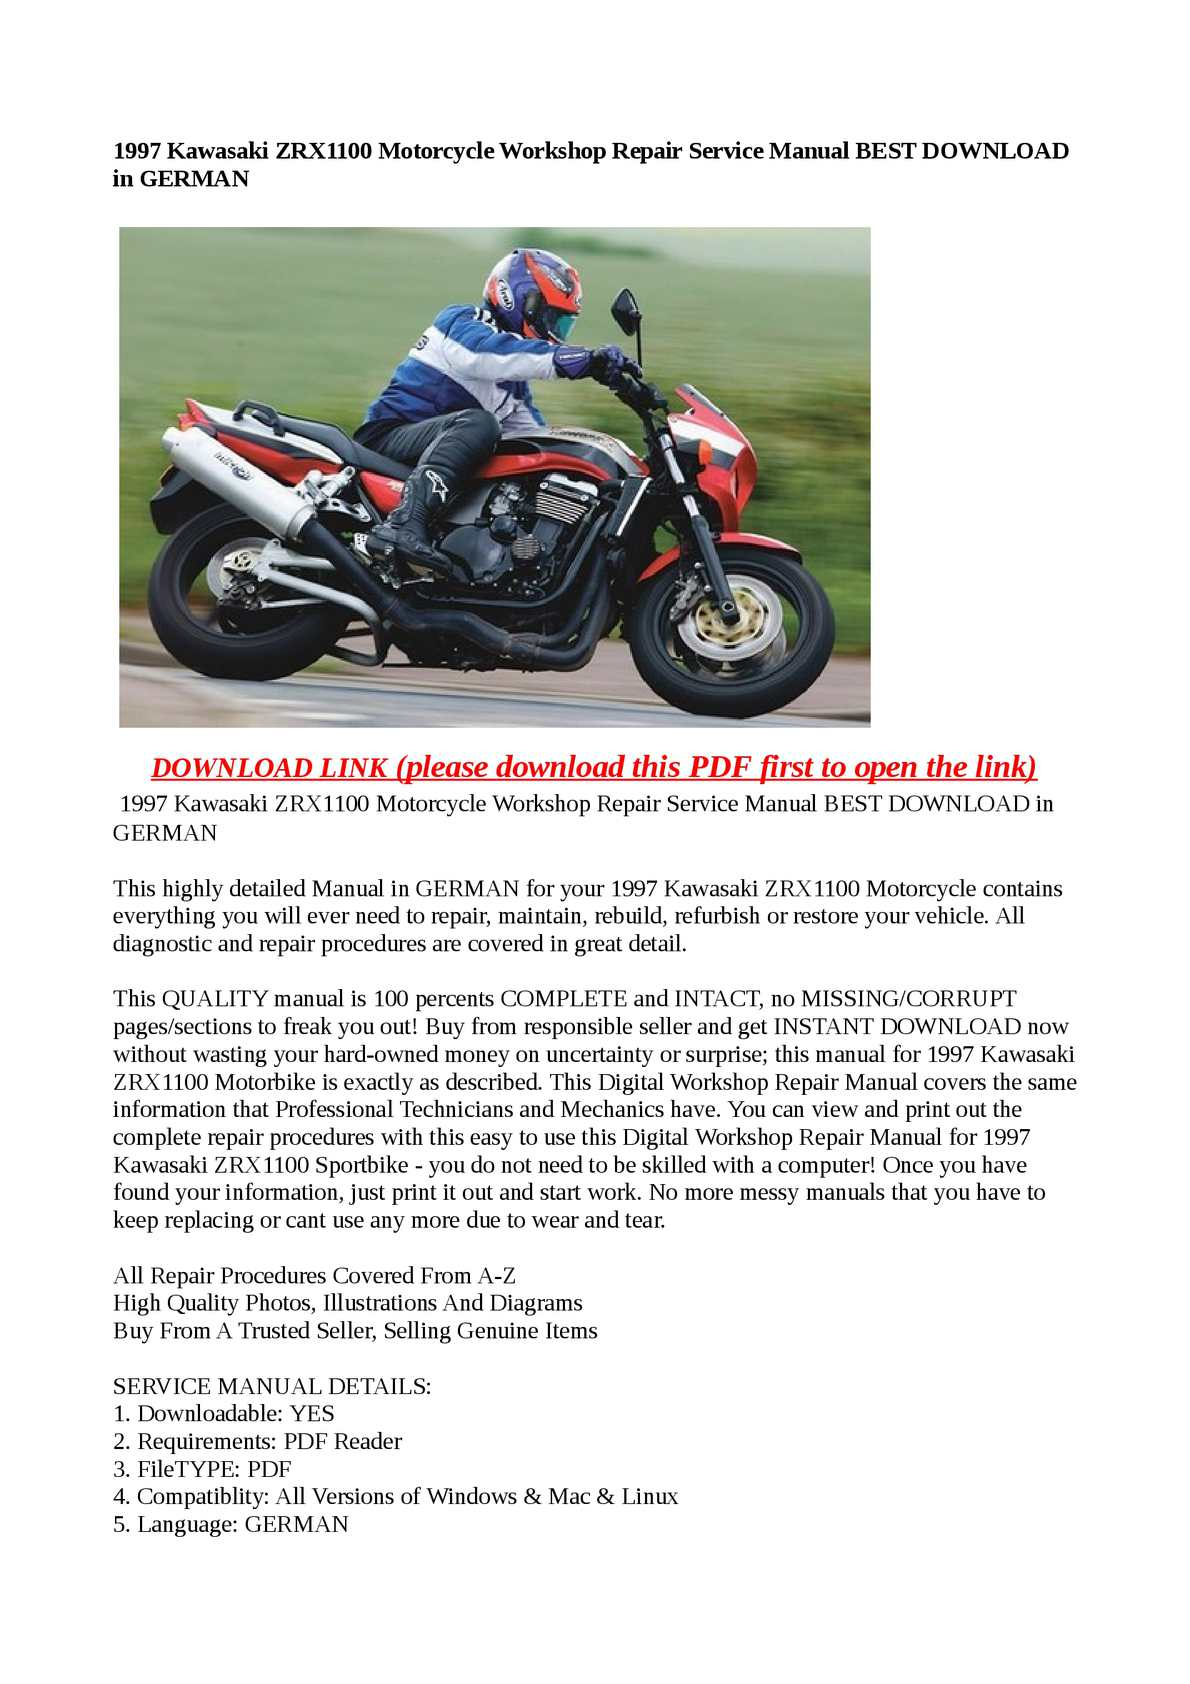 calam o 1997 kawasaki zrx1100 motorcycle workshop repair service rh calameo com kawasaki zrx 1100 service manual kawasaki zrx 1100 workshop manual